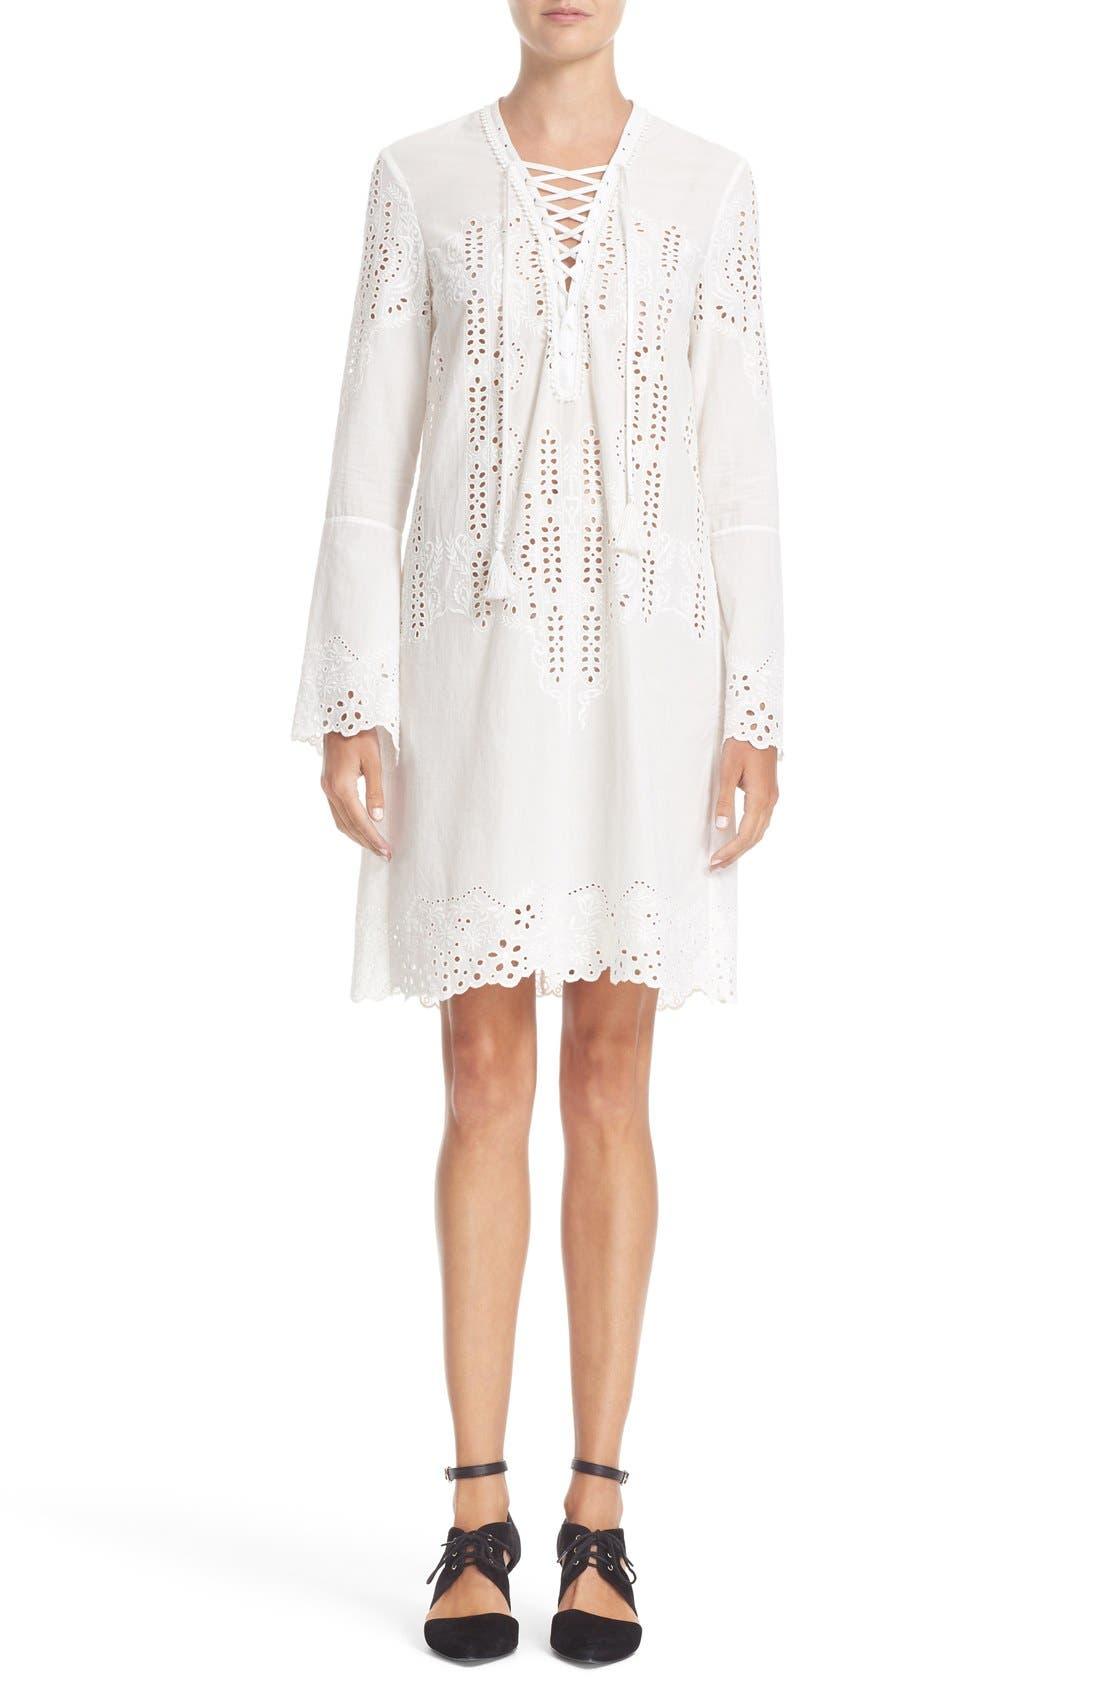 YIGAL AZROUËL Eyelet Embroidered Cotton Dress